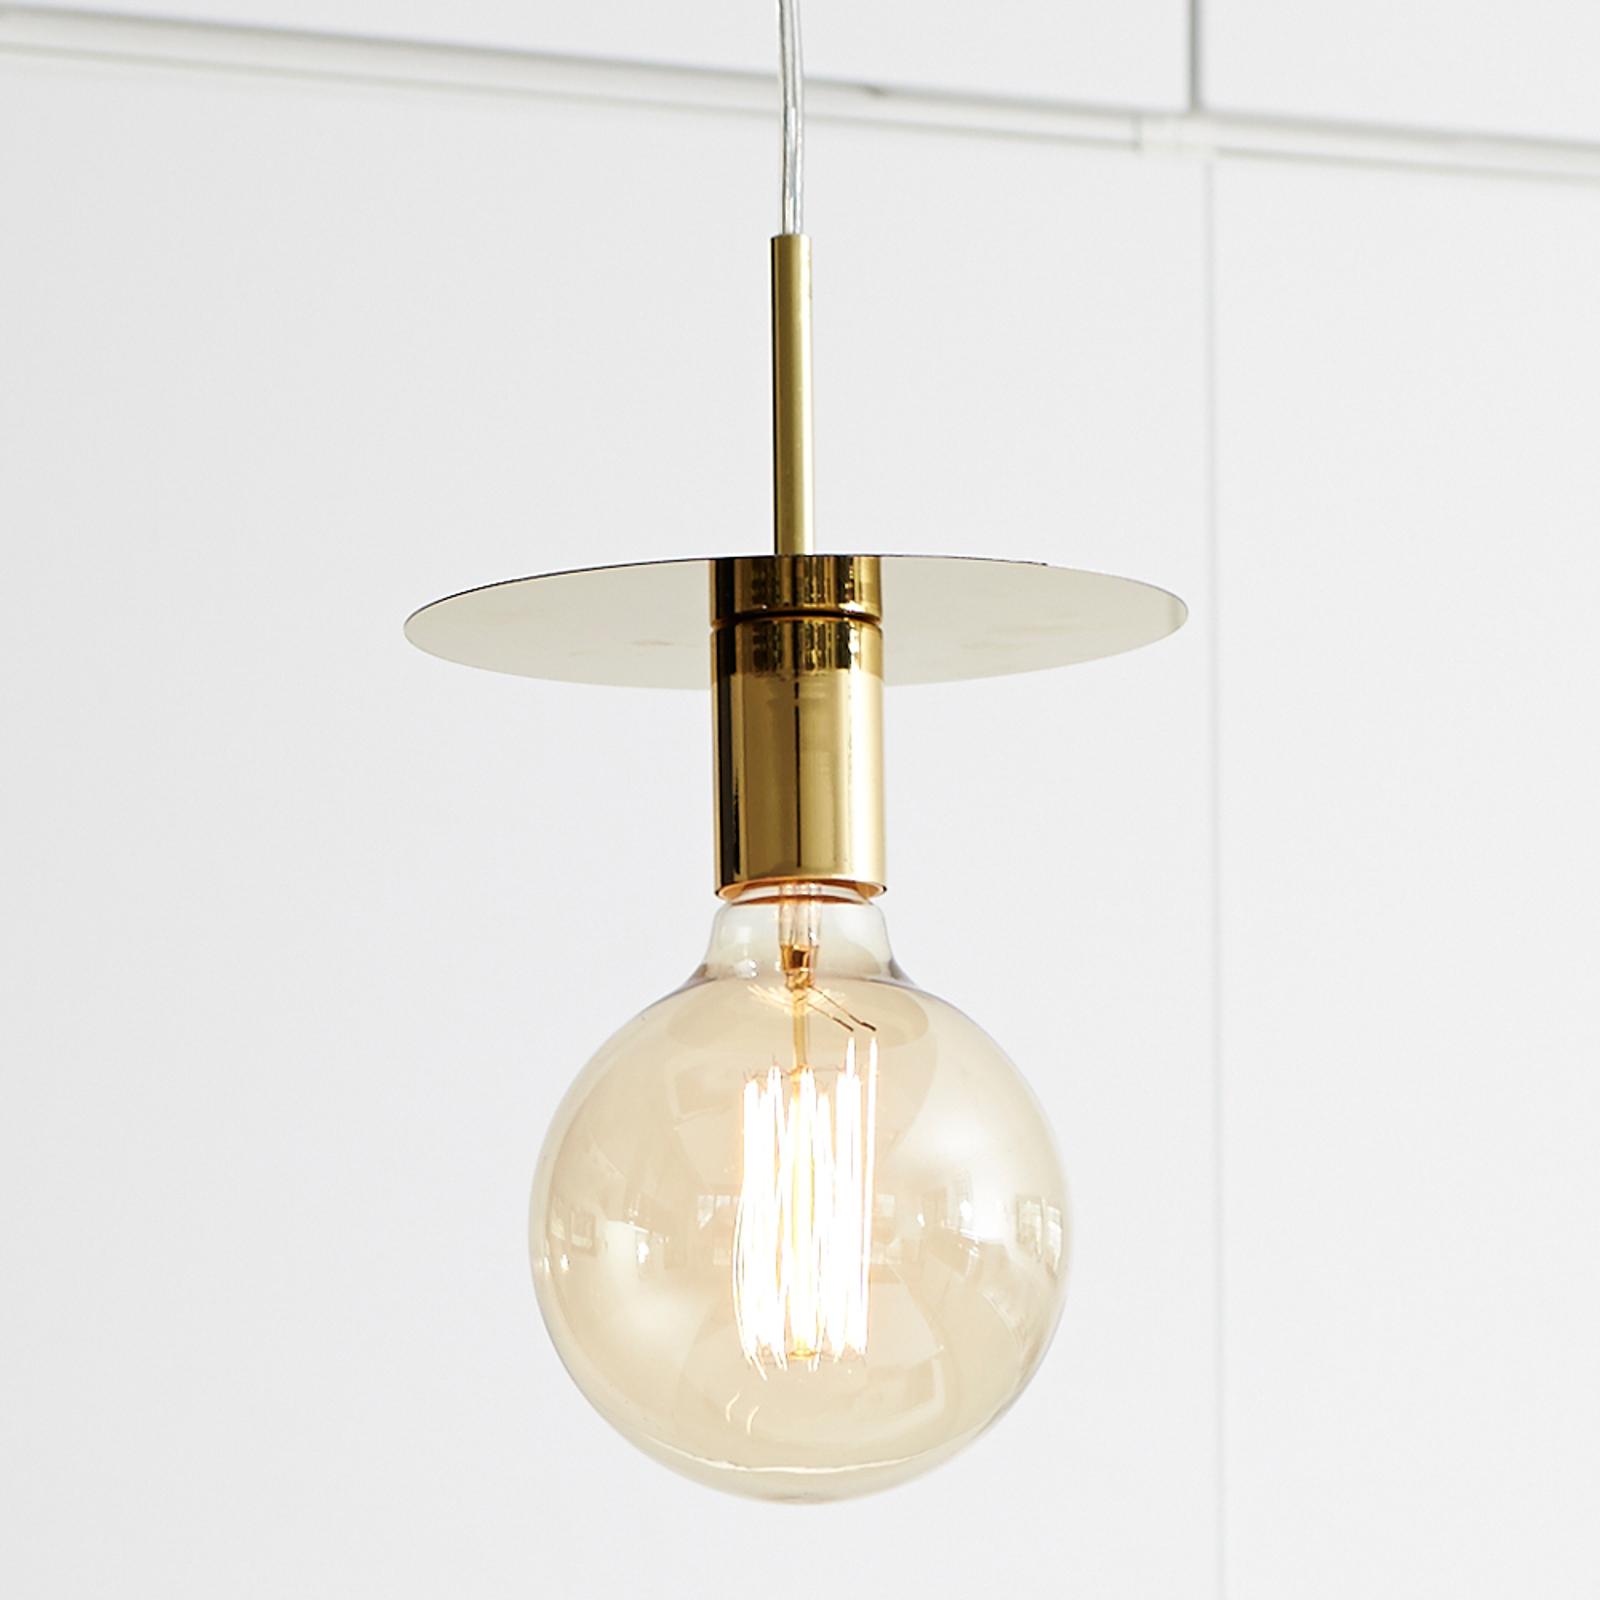 Opvallende hanglamp Disc